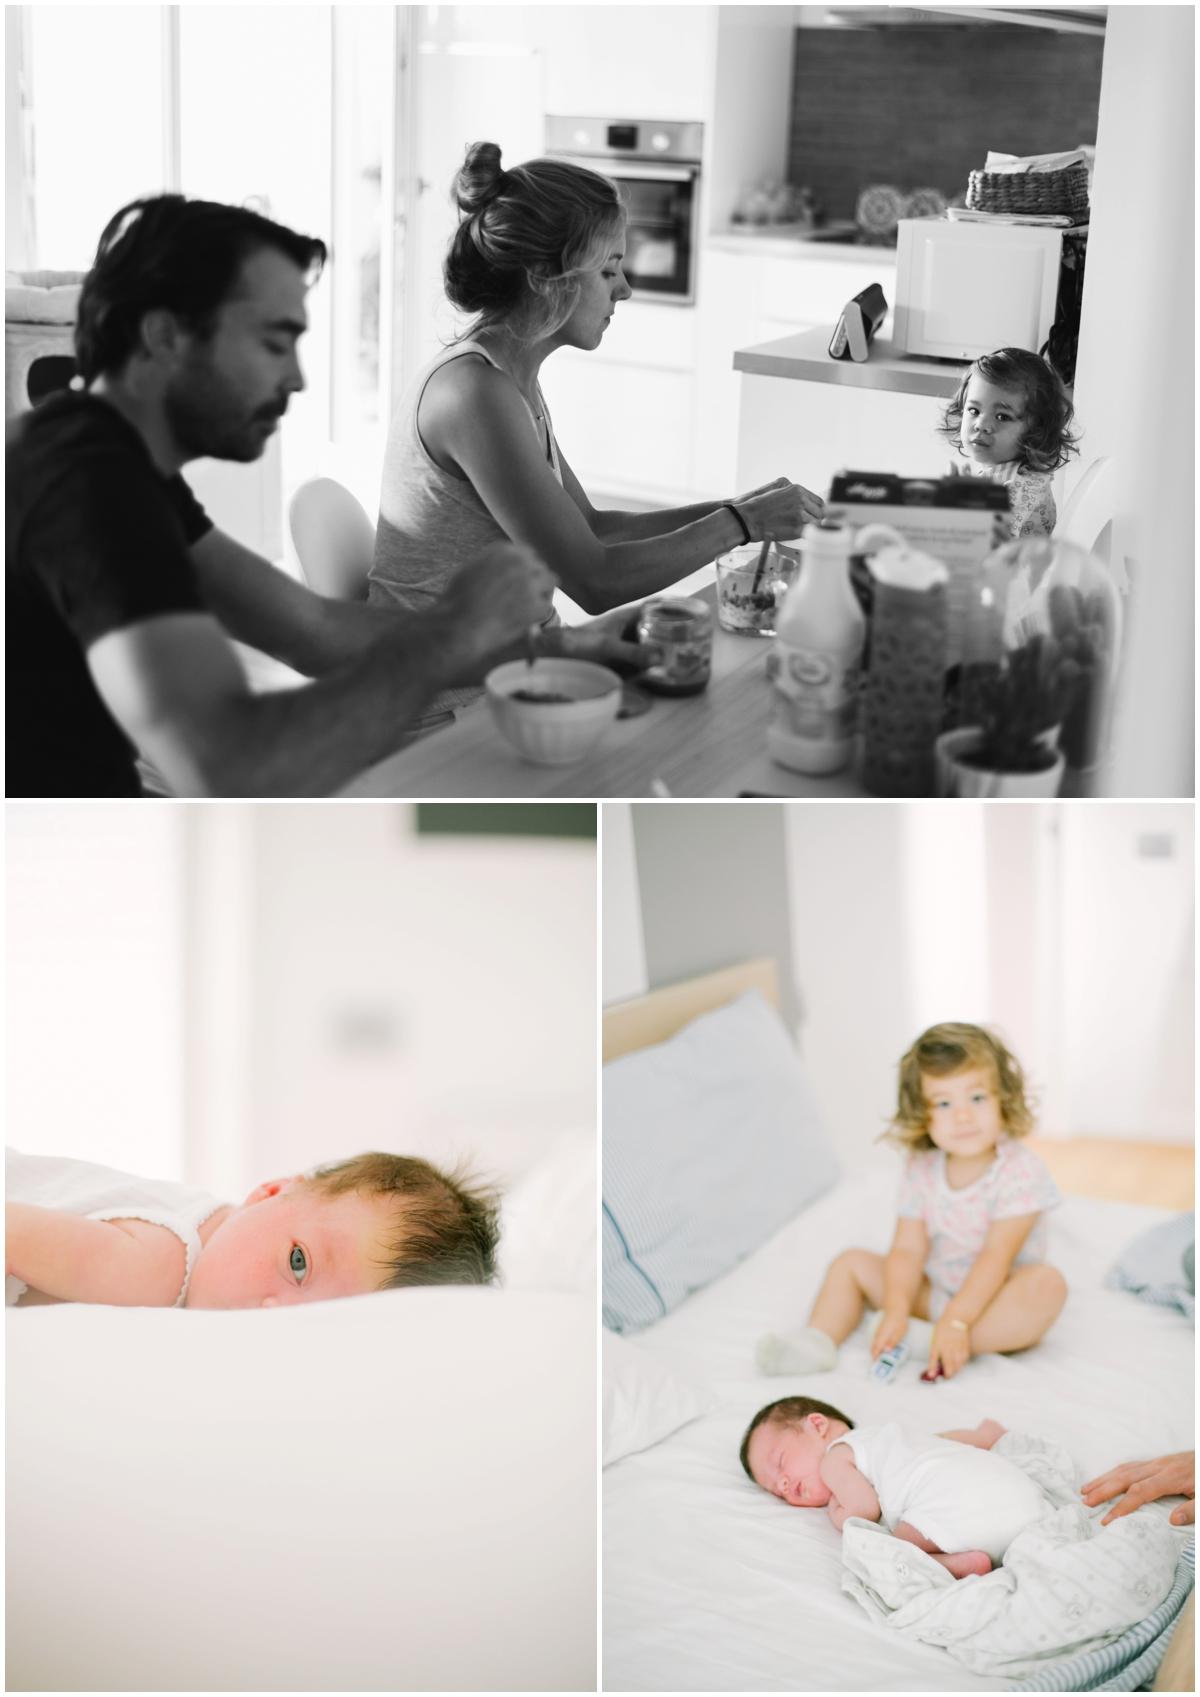 Alea+Lovely+Family+Portraits_0001.jpg